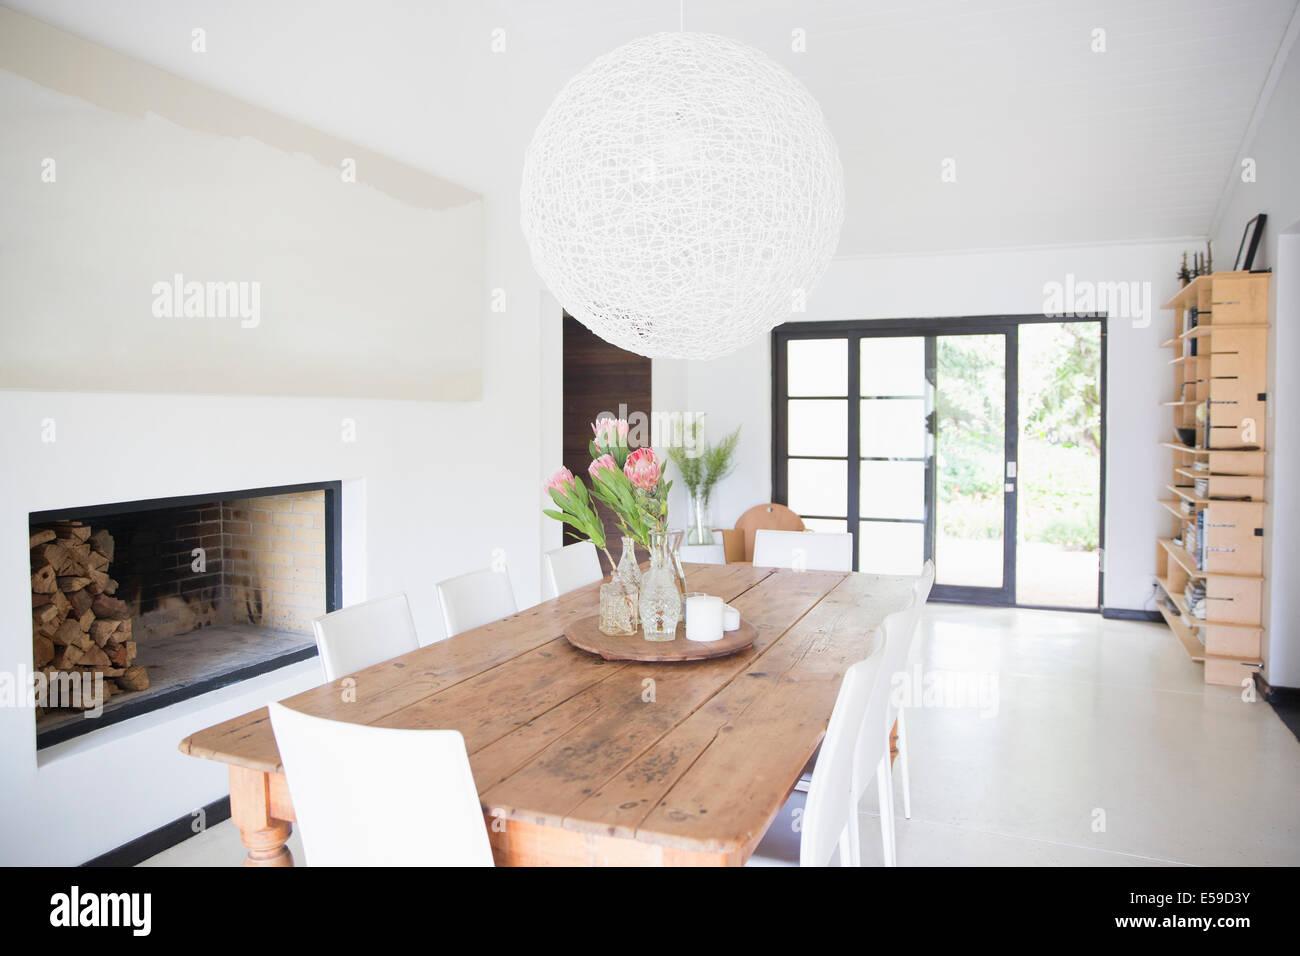 esstisch leuchte affordable kristall cattelan italia kidal online kaufen boronode with esstisch. Black Bedroom Furniture Sets. Home Design Ideas